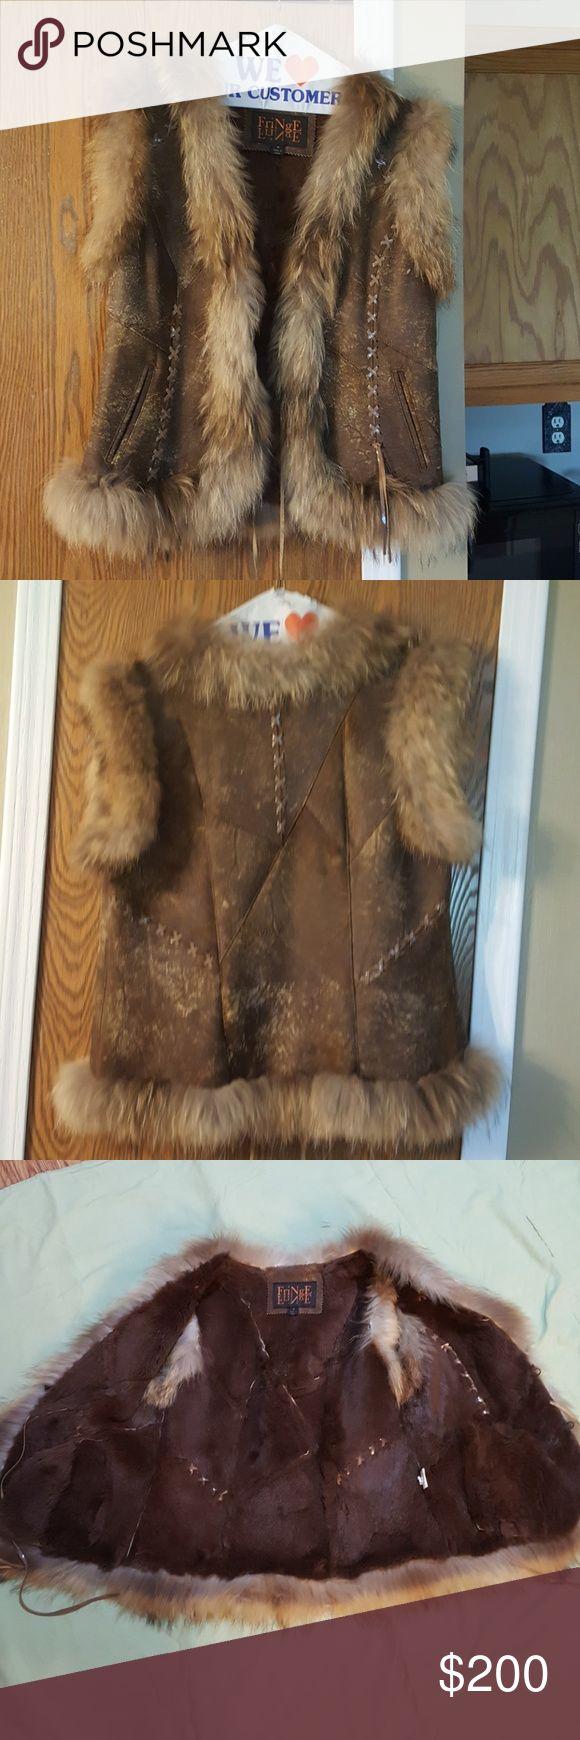 FriNge fur vest Racoon and rabbit fur vest, worn only once, bought in Las Vegas Jackets & Coats Vests